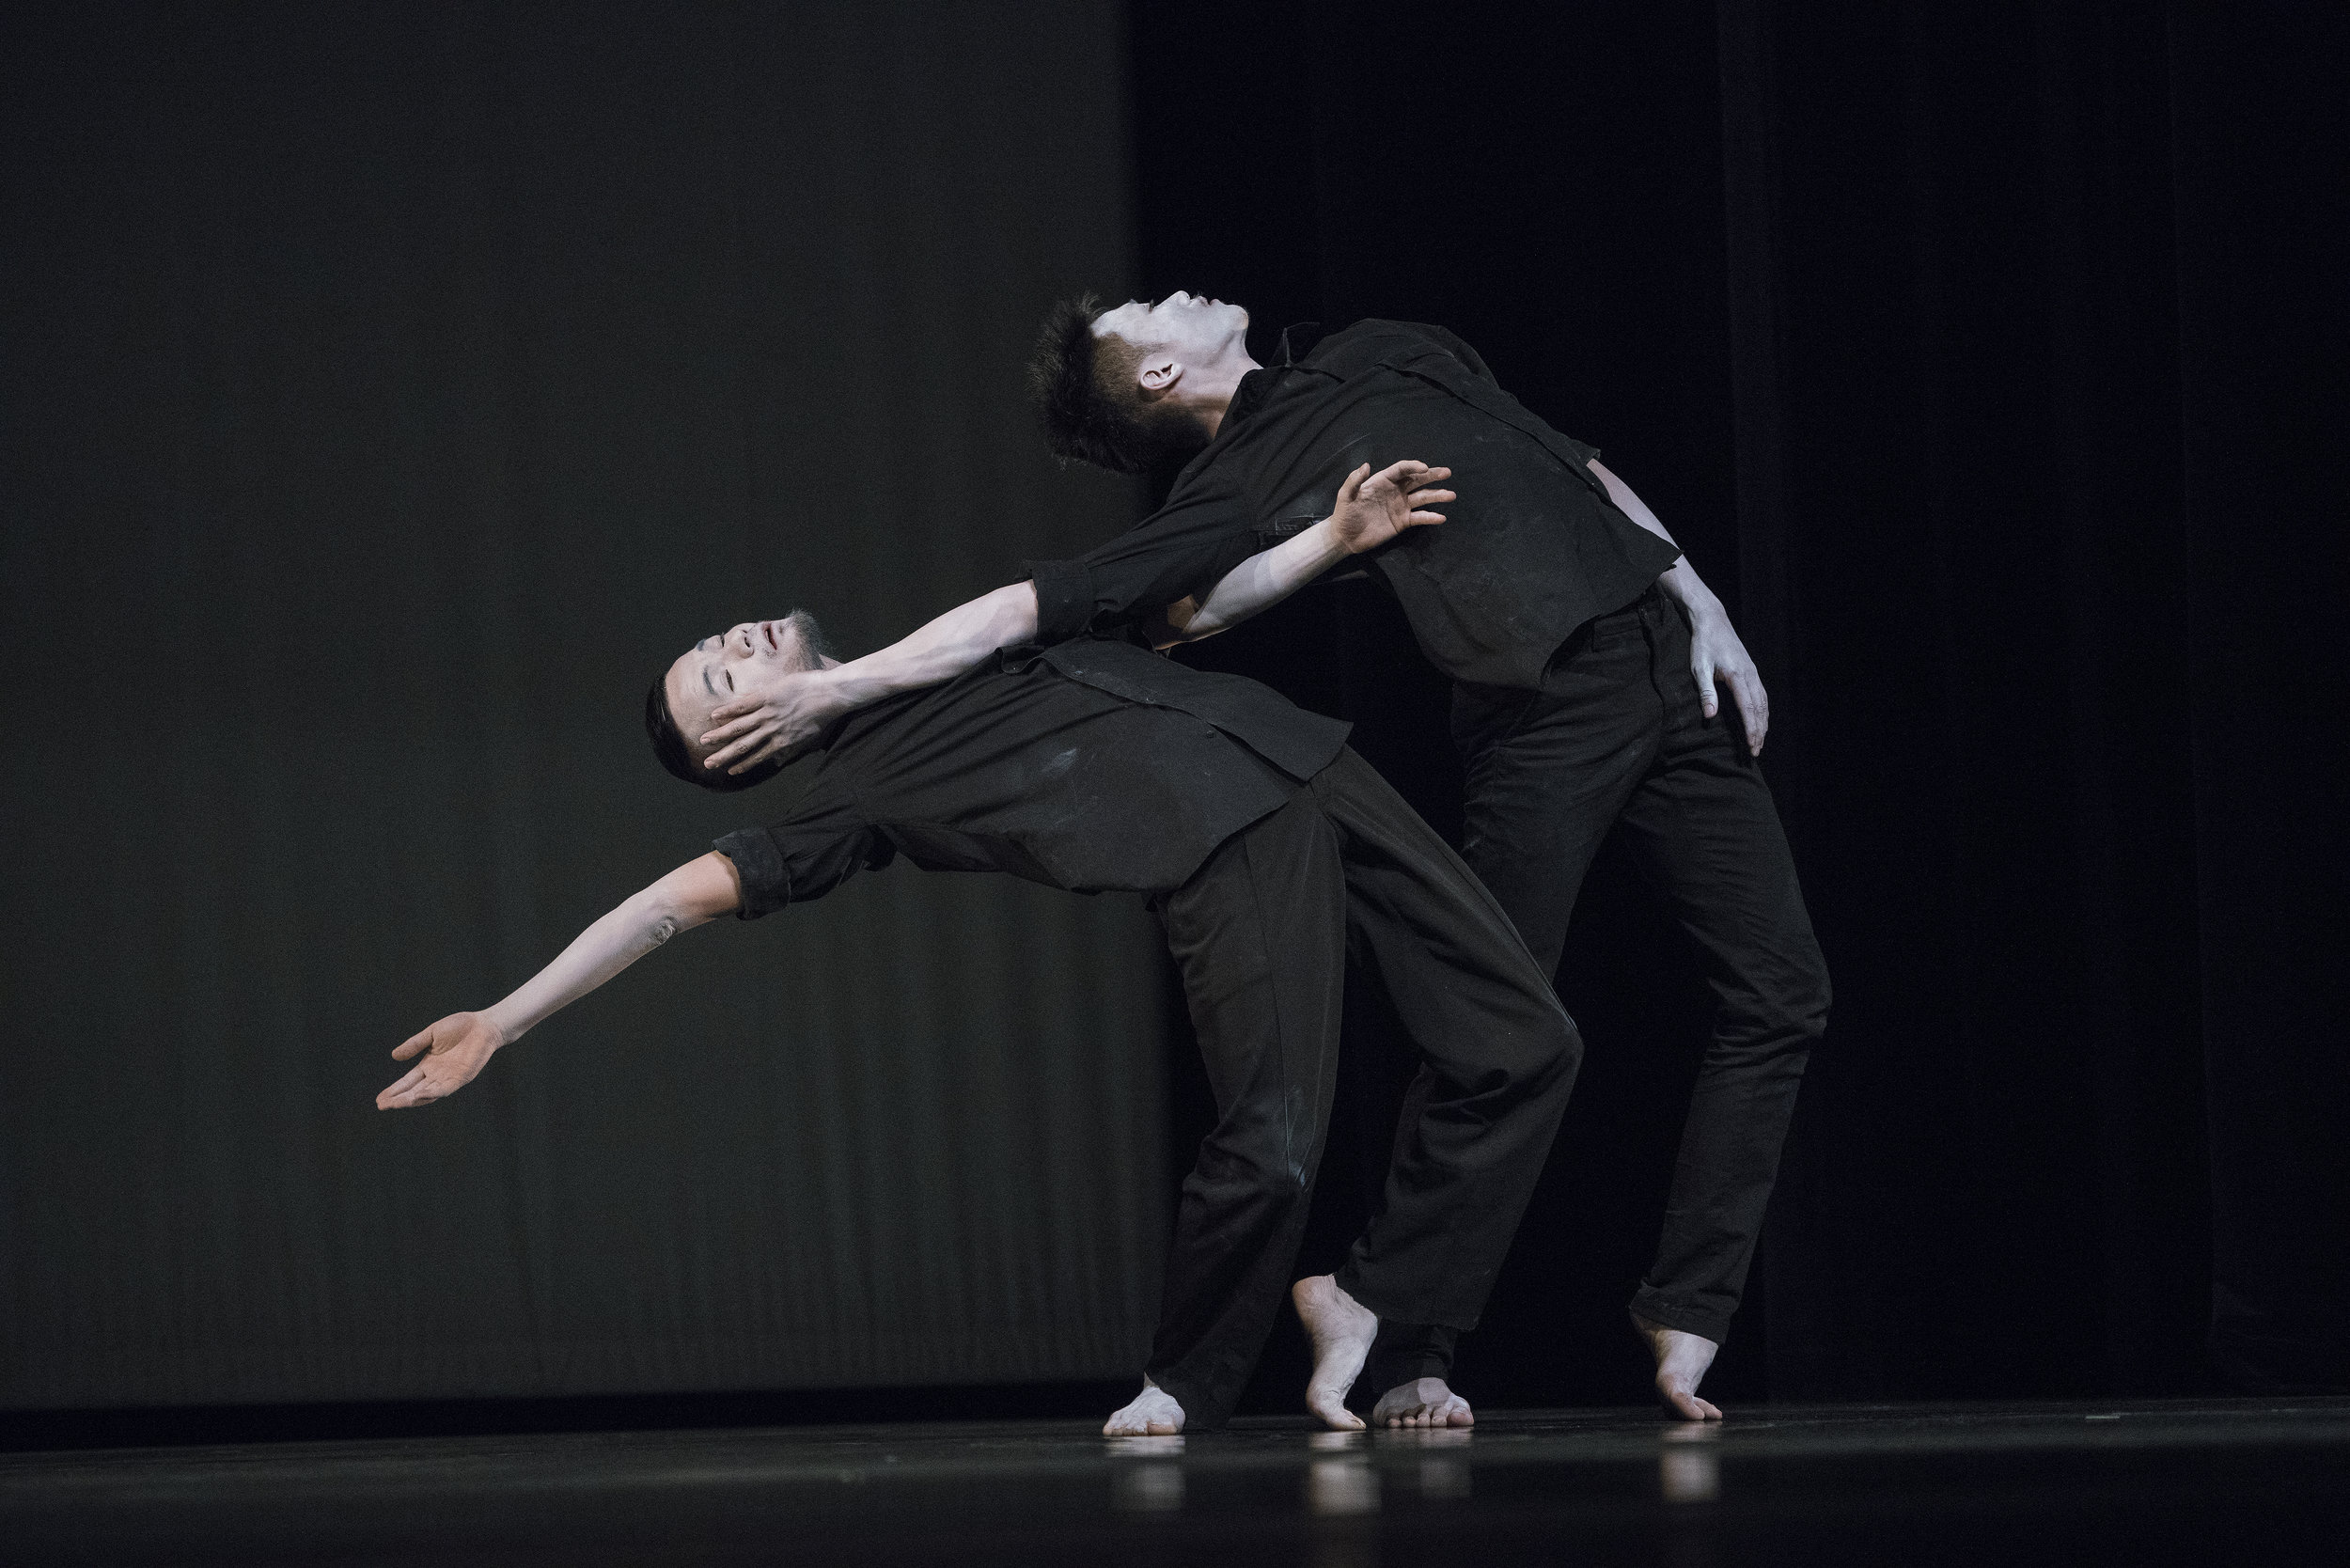 2. Preis - Relationships, Zhiren Xiao.jpg